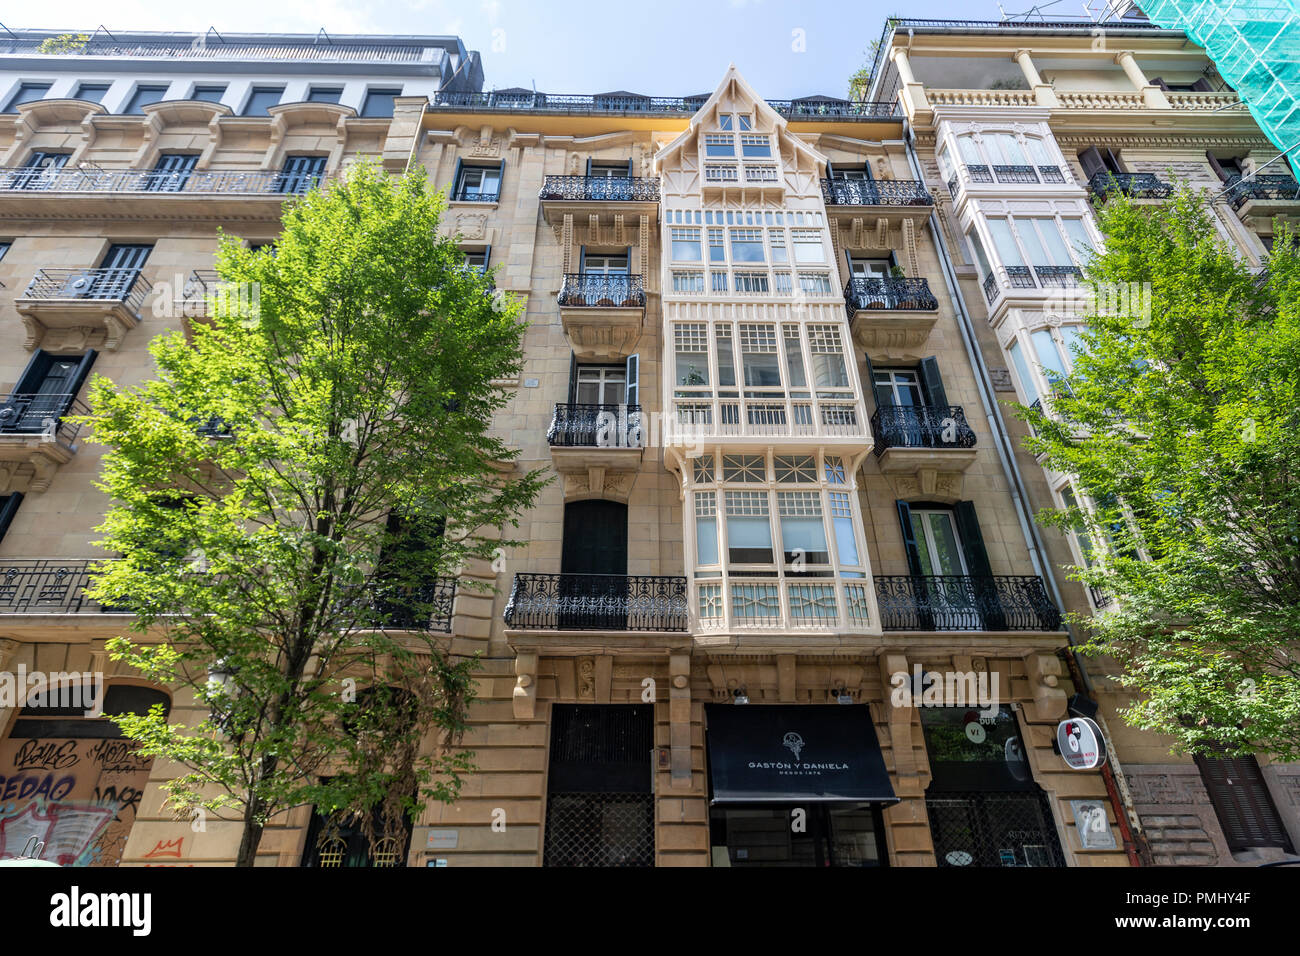 Apartment building in Prim Kalea, Donostia, Basque Country, Spain - Stock Image